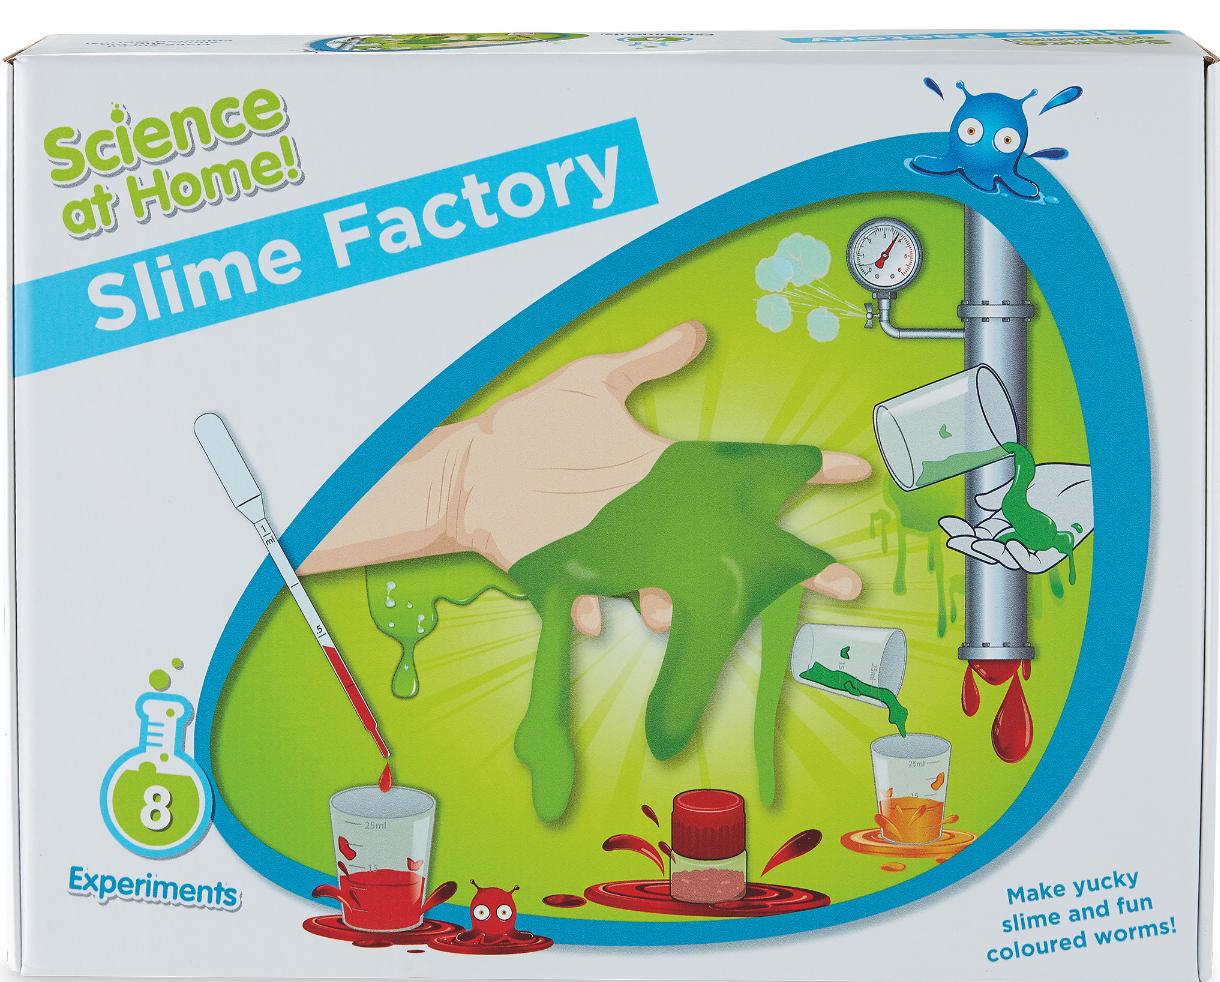 Slime factory £5.99 instore @ Aldi